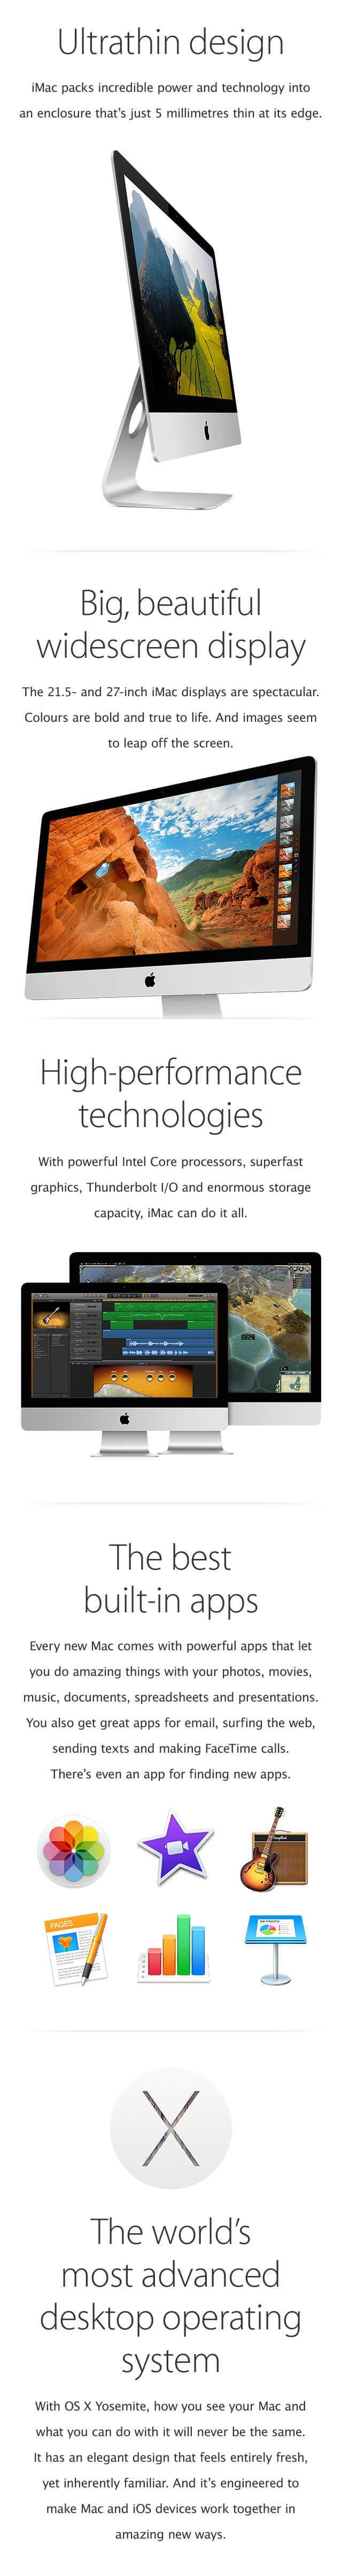 iMac 2 mobile